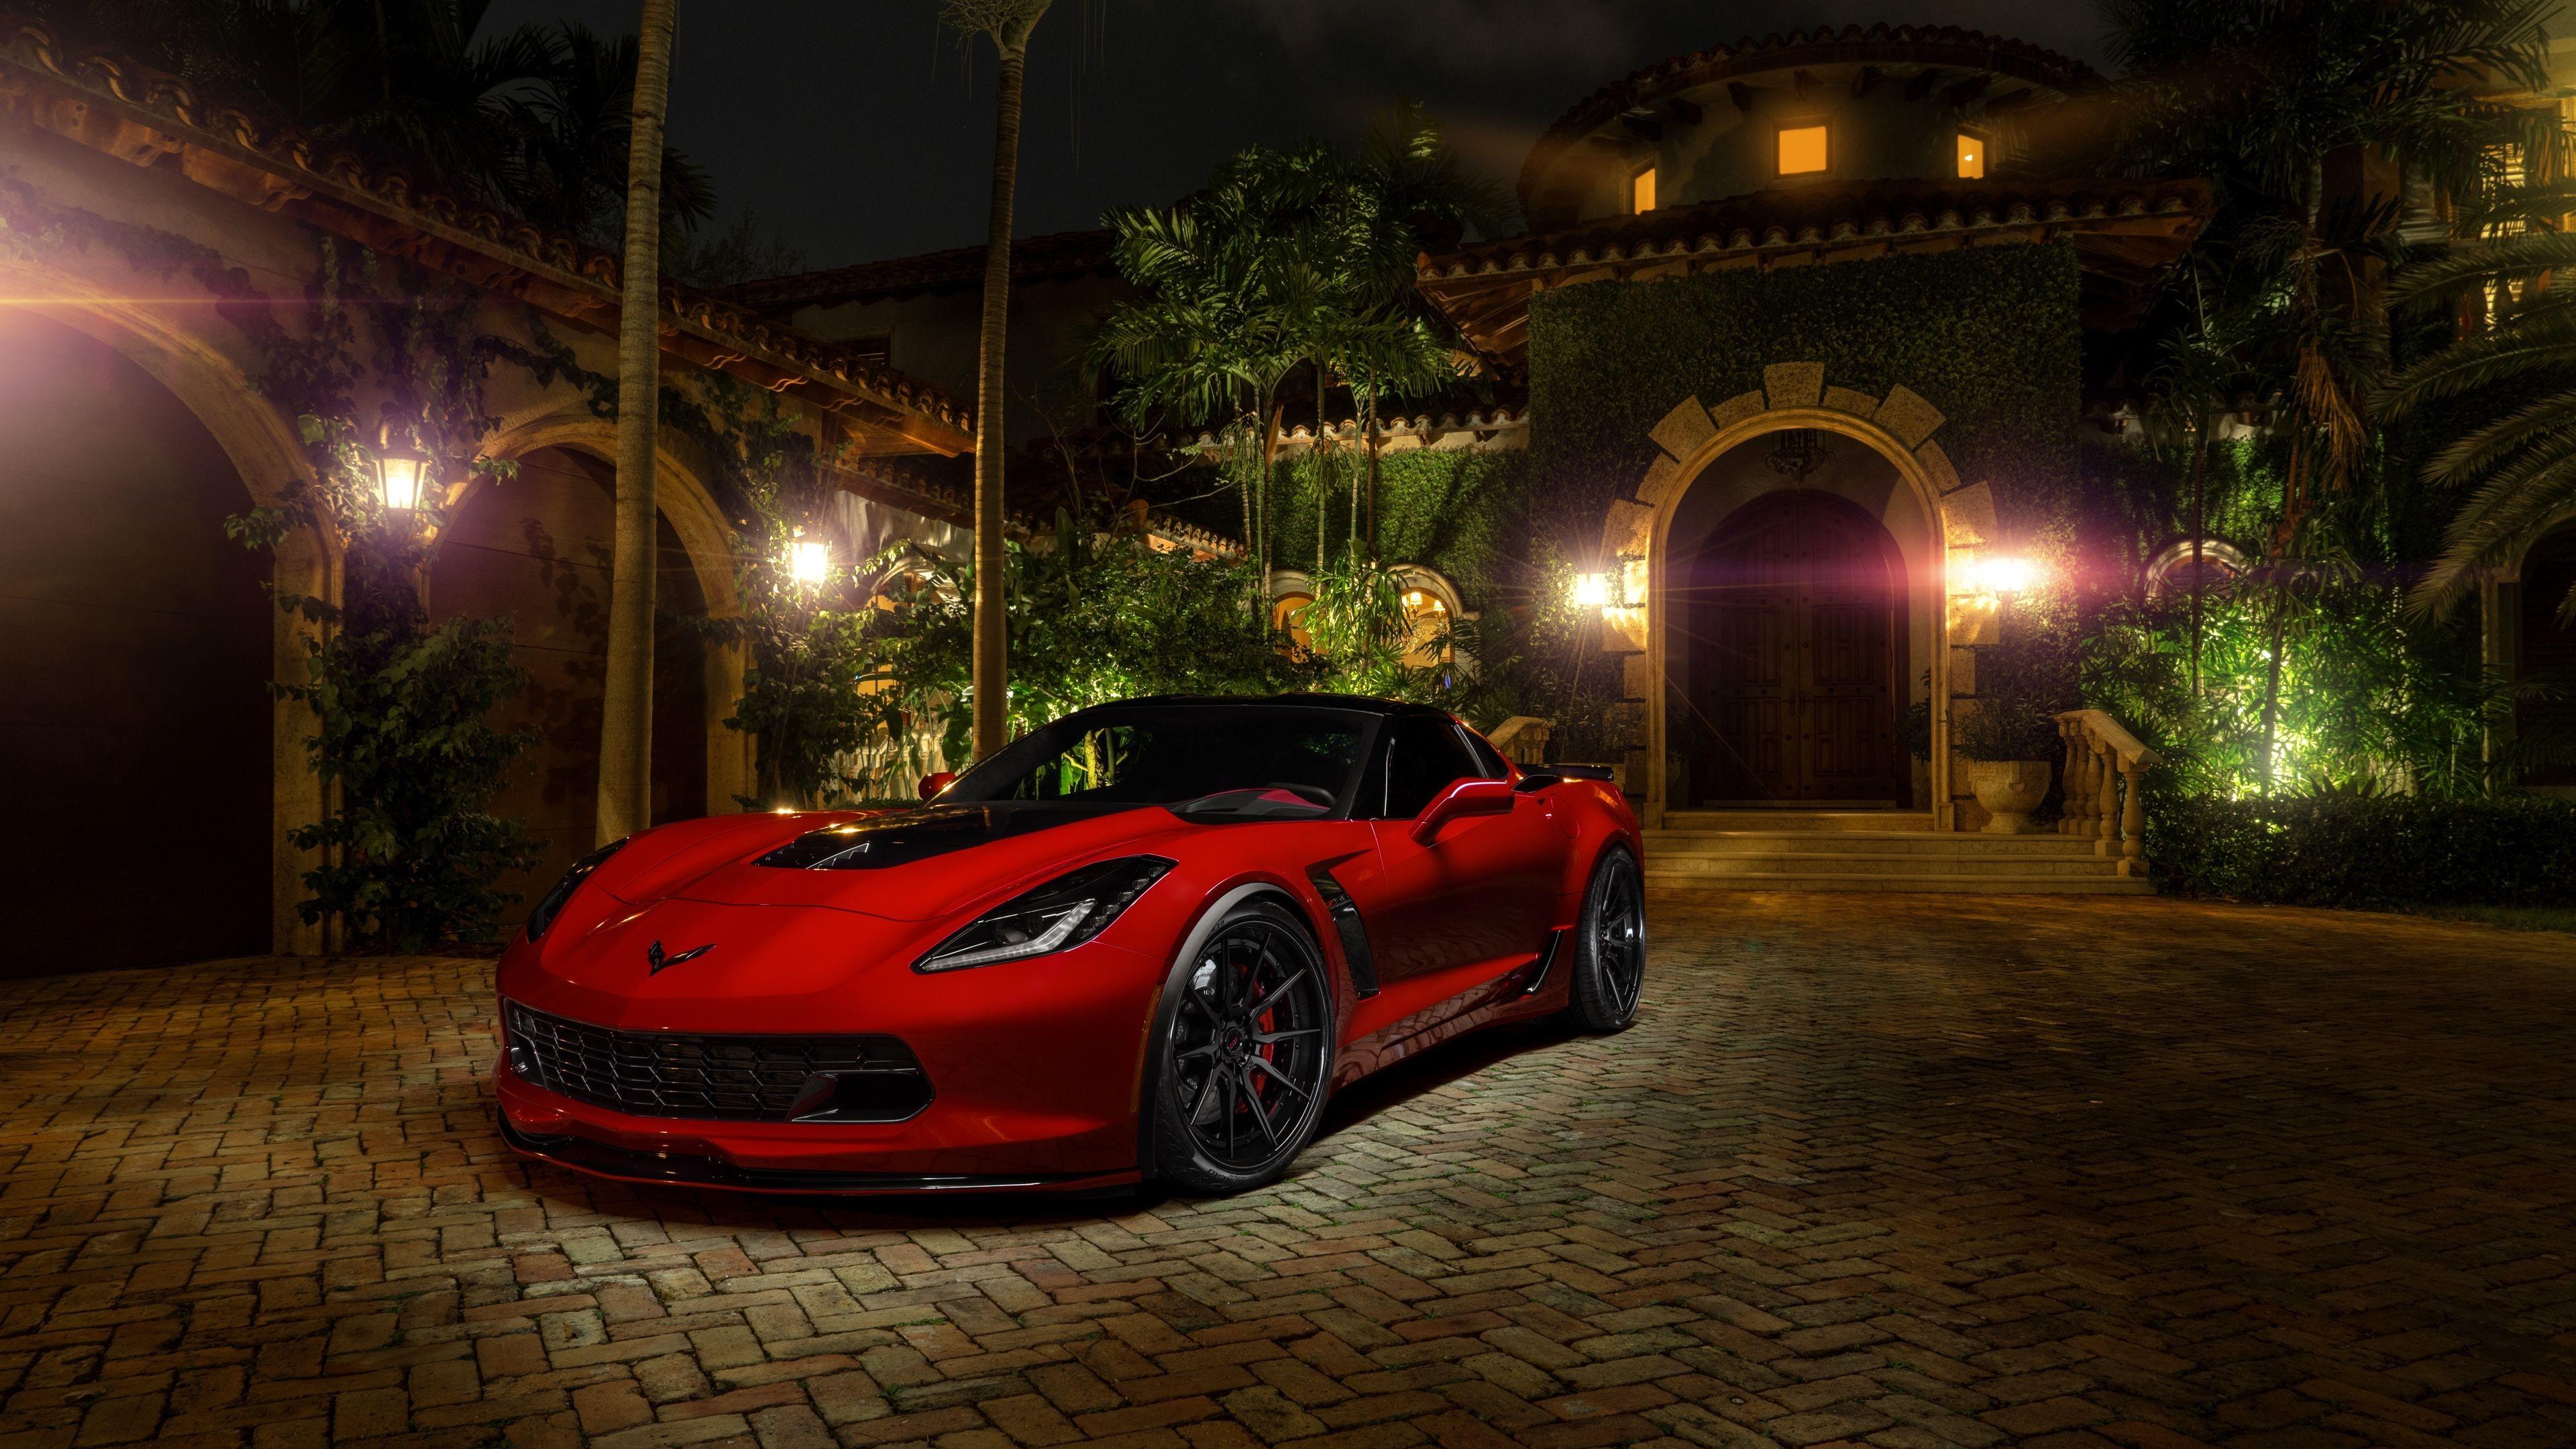 72 C7 Corvette Wallpapers on WallpaperPlay 3840x2160